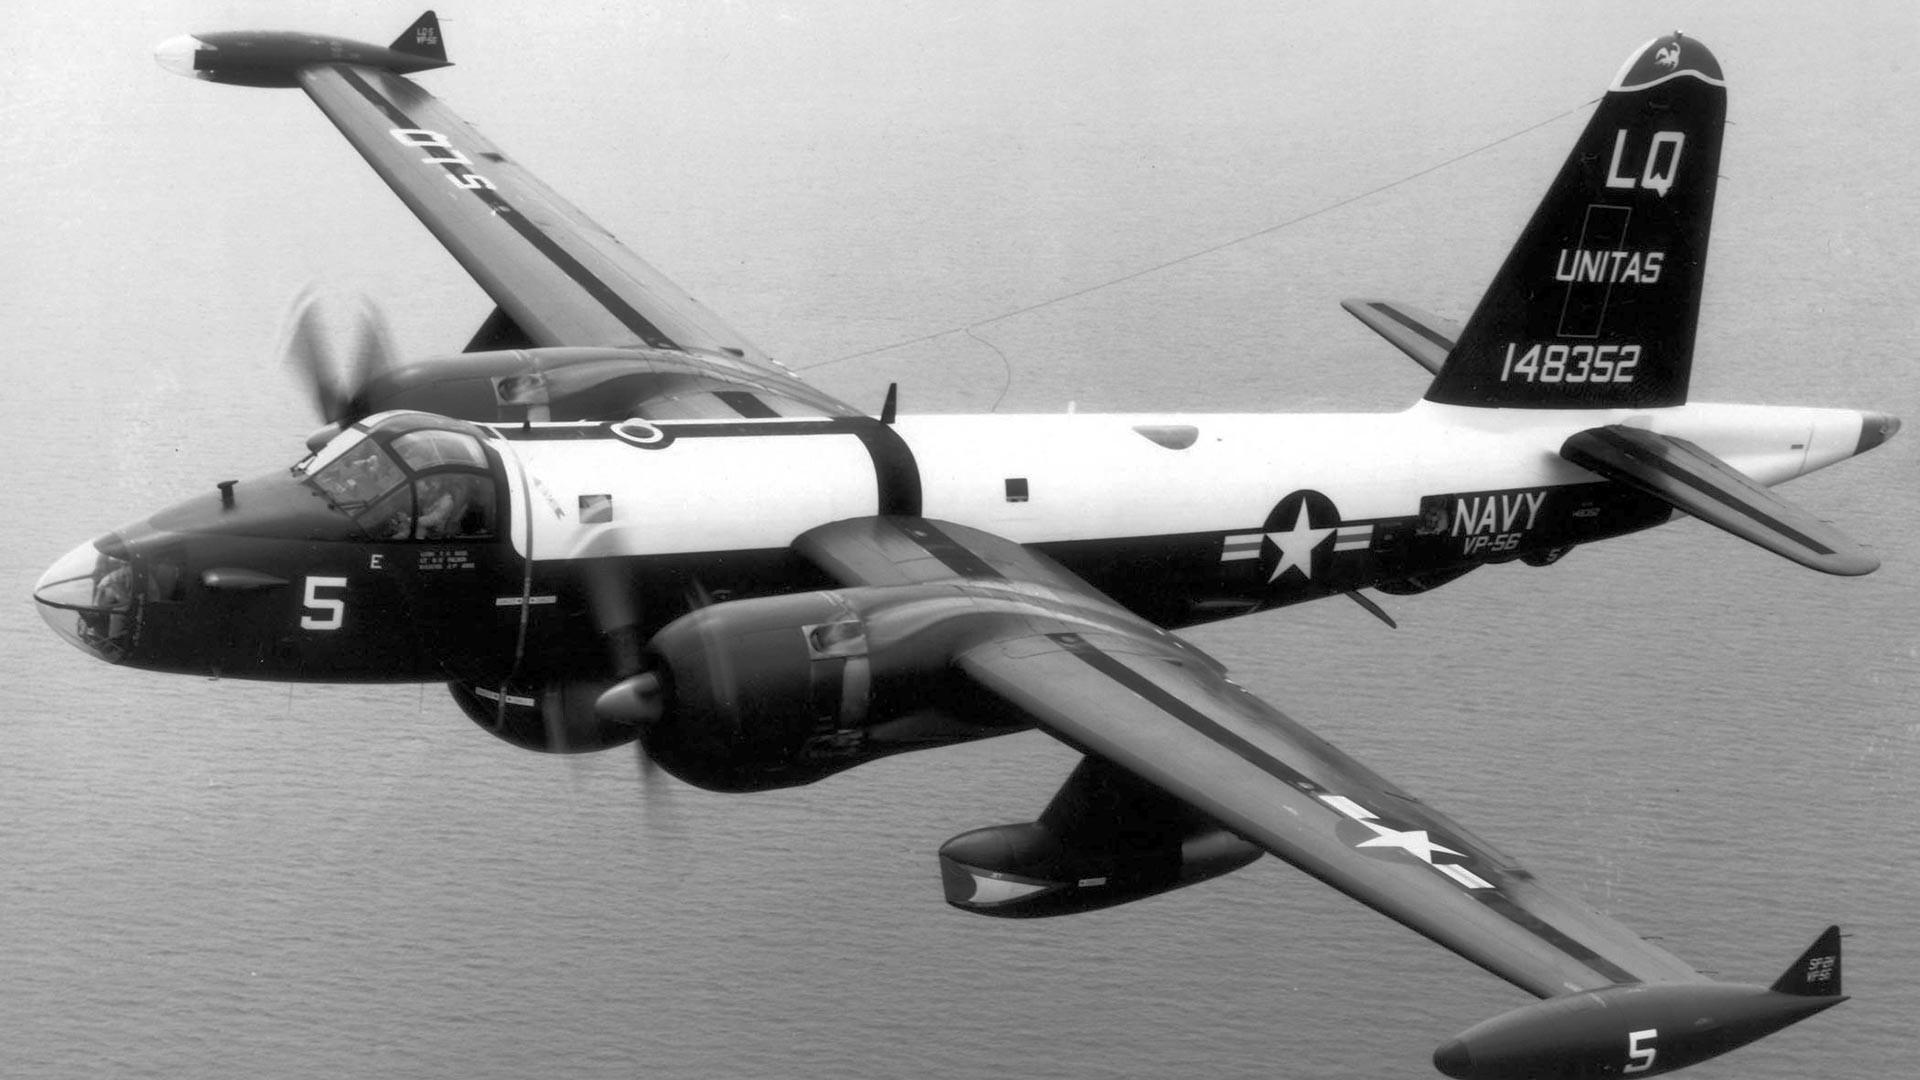 Lockheed P-2 Neptune reconnaissance aircraft.